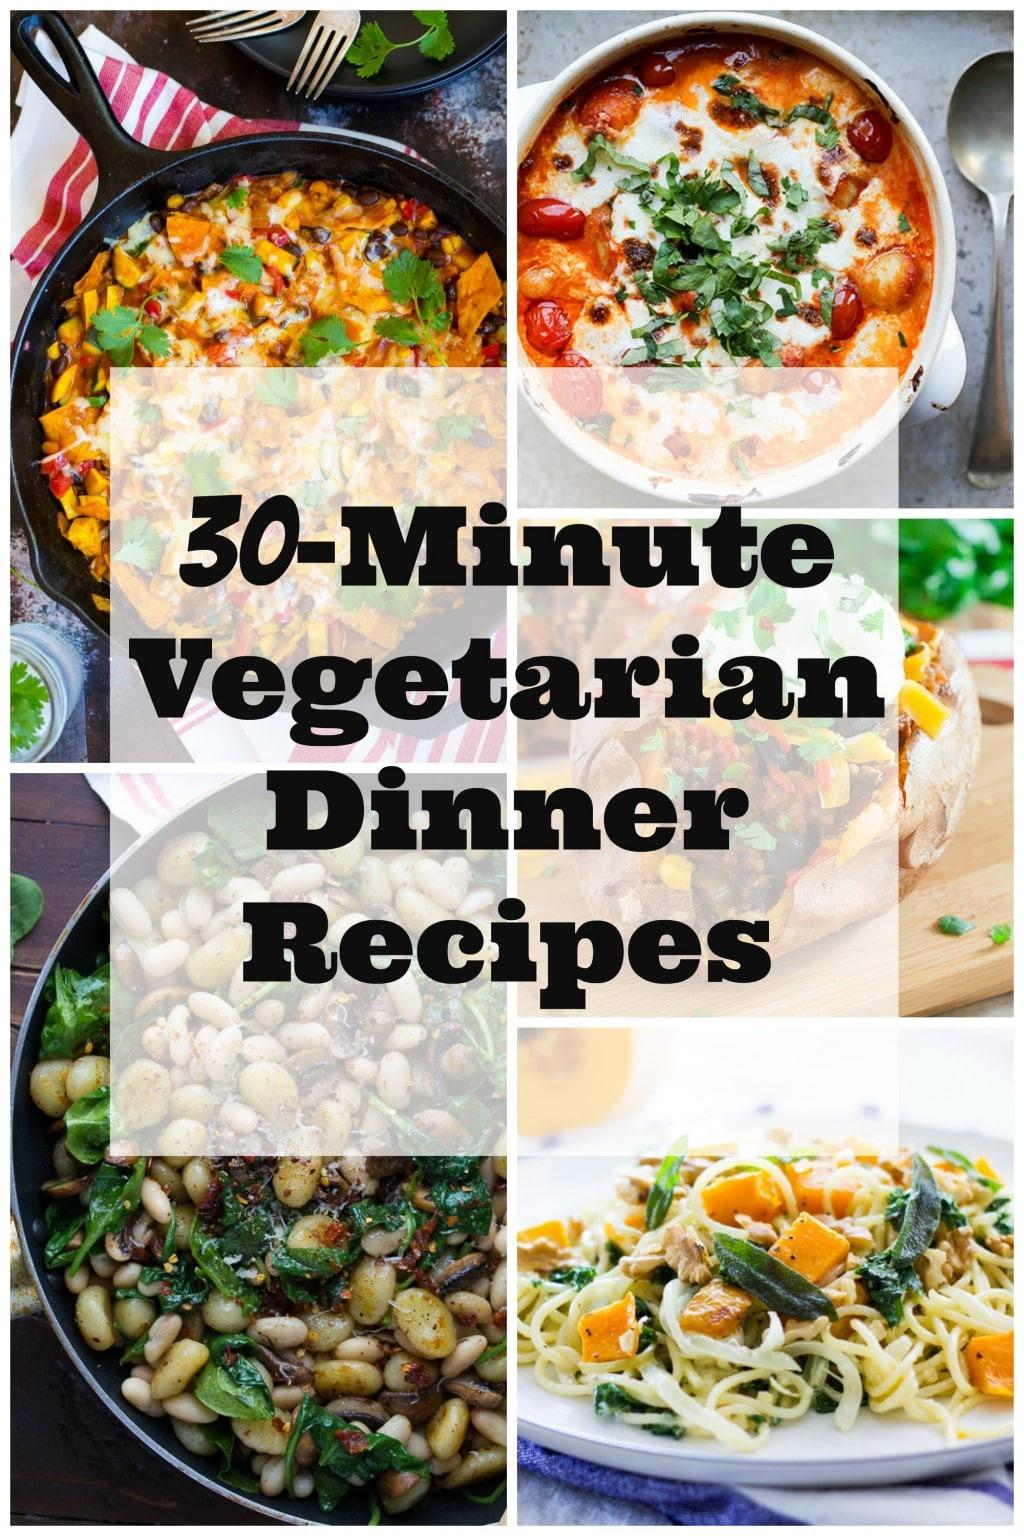 What To Make For Dinner Vegetarian  30 Minute Ve arian Dinner Recipes She Likes Food